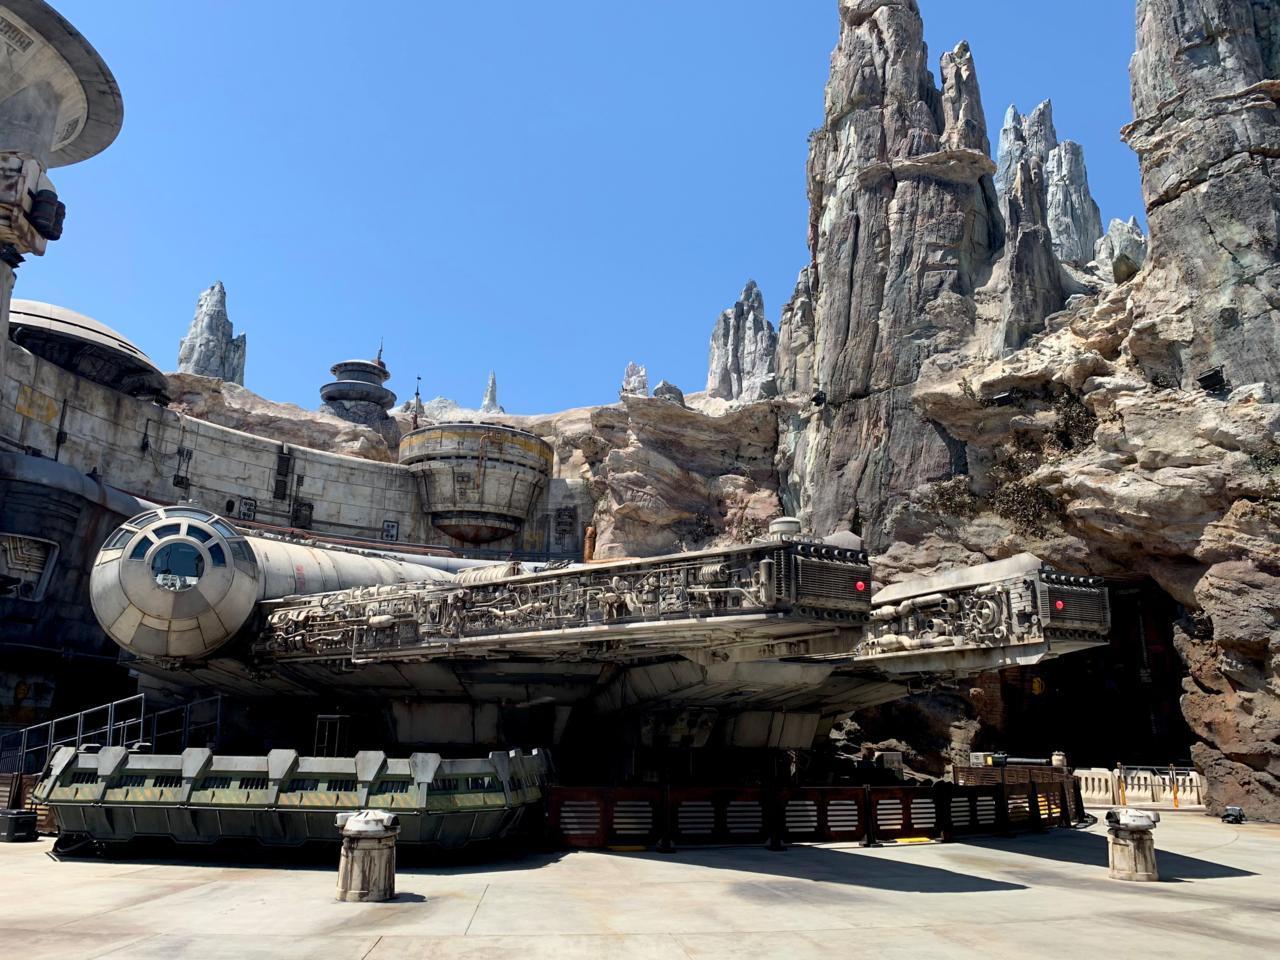 In a corner of Disneyland far, far away.